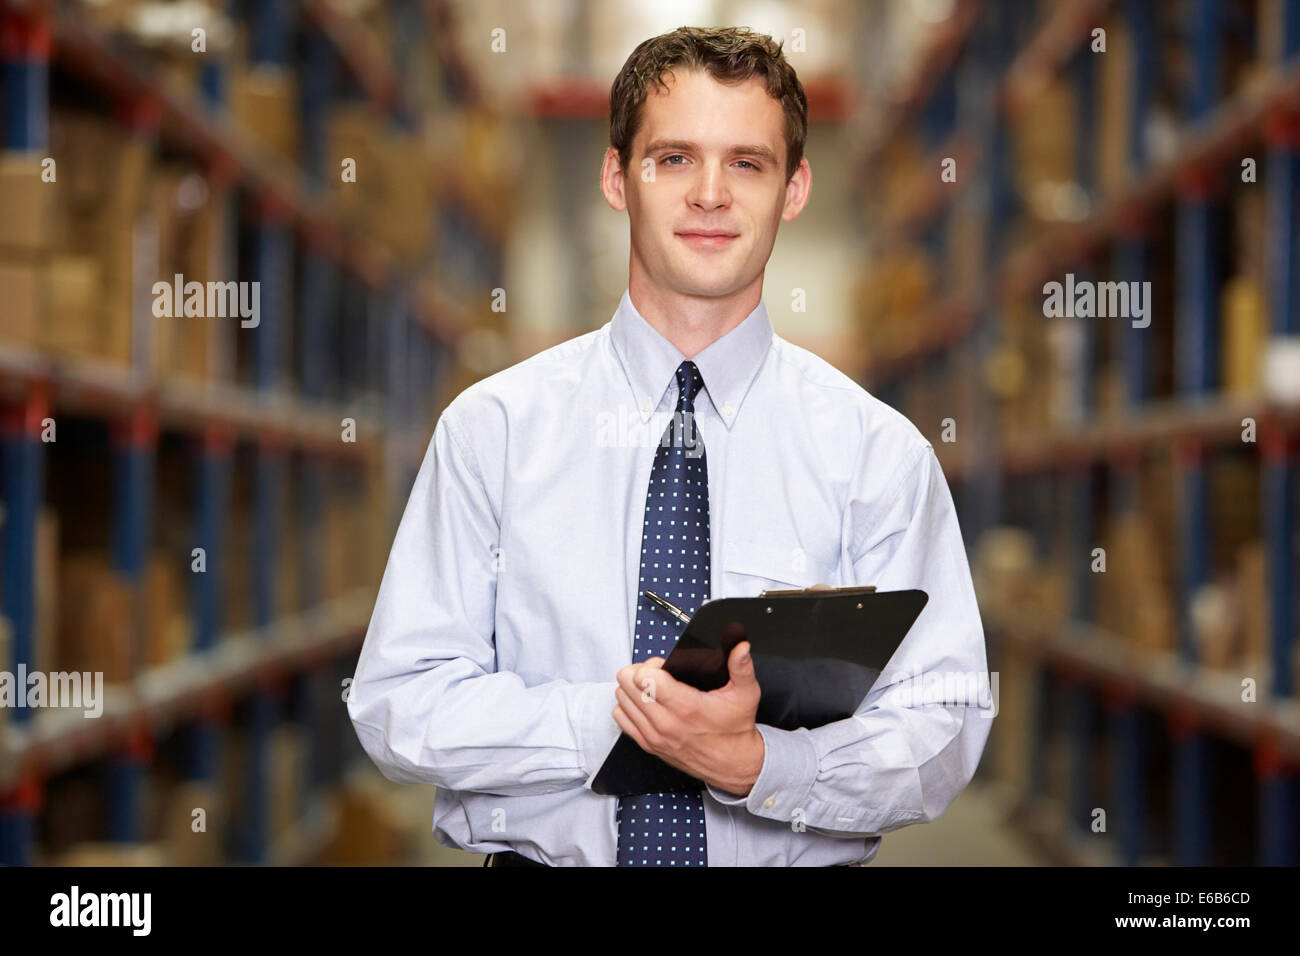 logistics s inventory warehouse clerk stock photo royalty stock photo logistics s inventory warehouse clerk